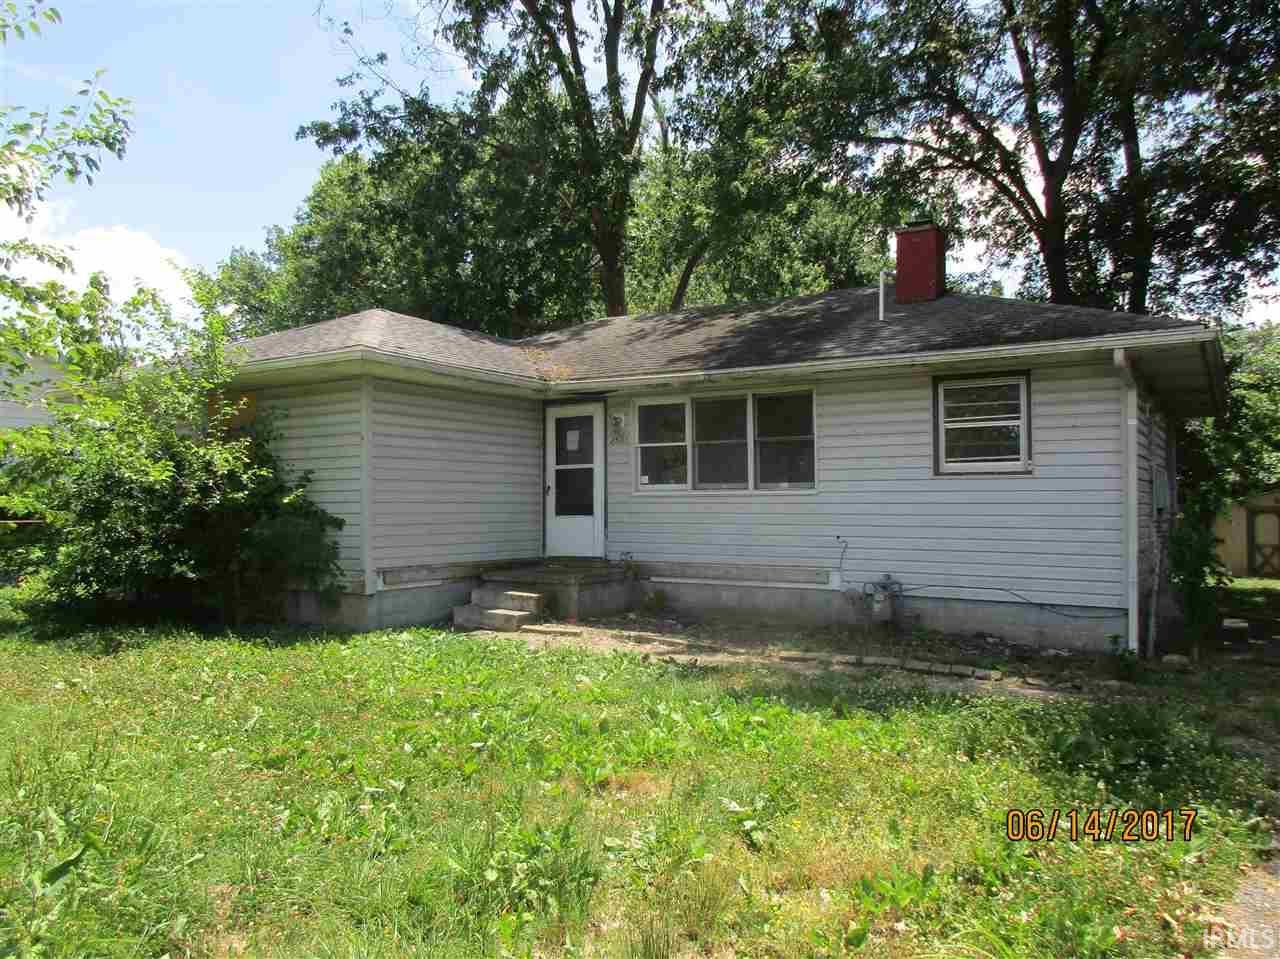 2501 SWEETSER, Evansville, IN 47714